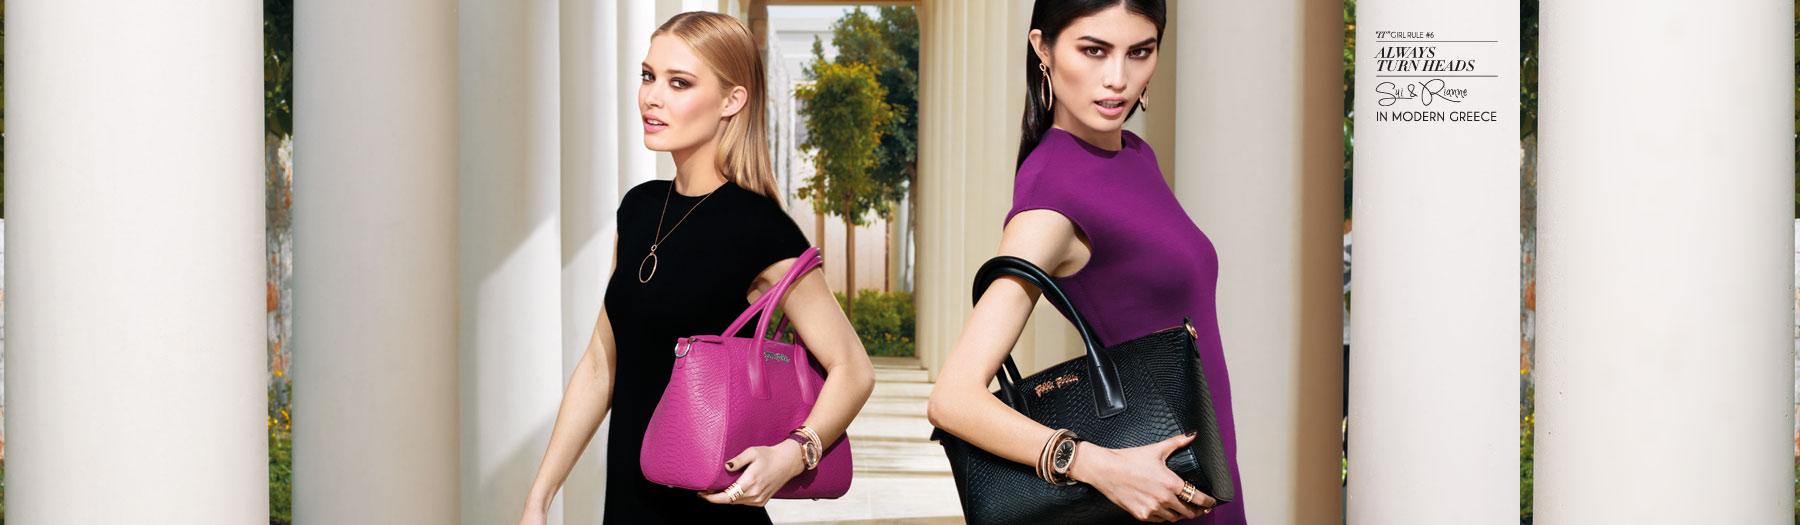 Folli Follie USA Official Shop | Women's Jewelry, Watches & Accessories